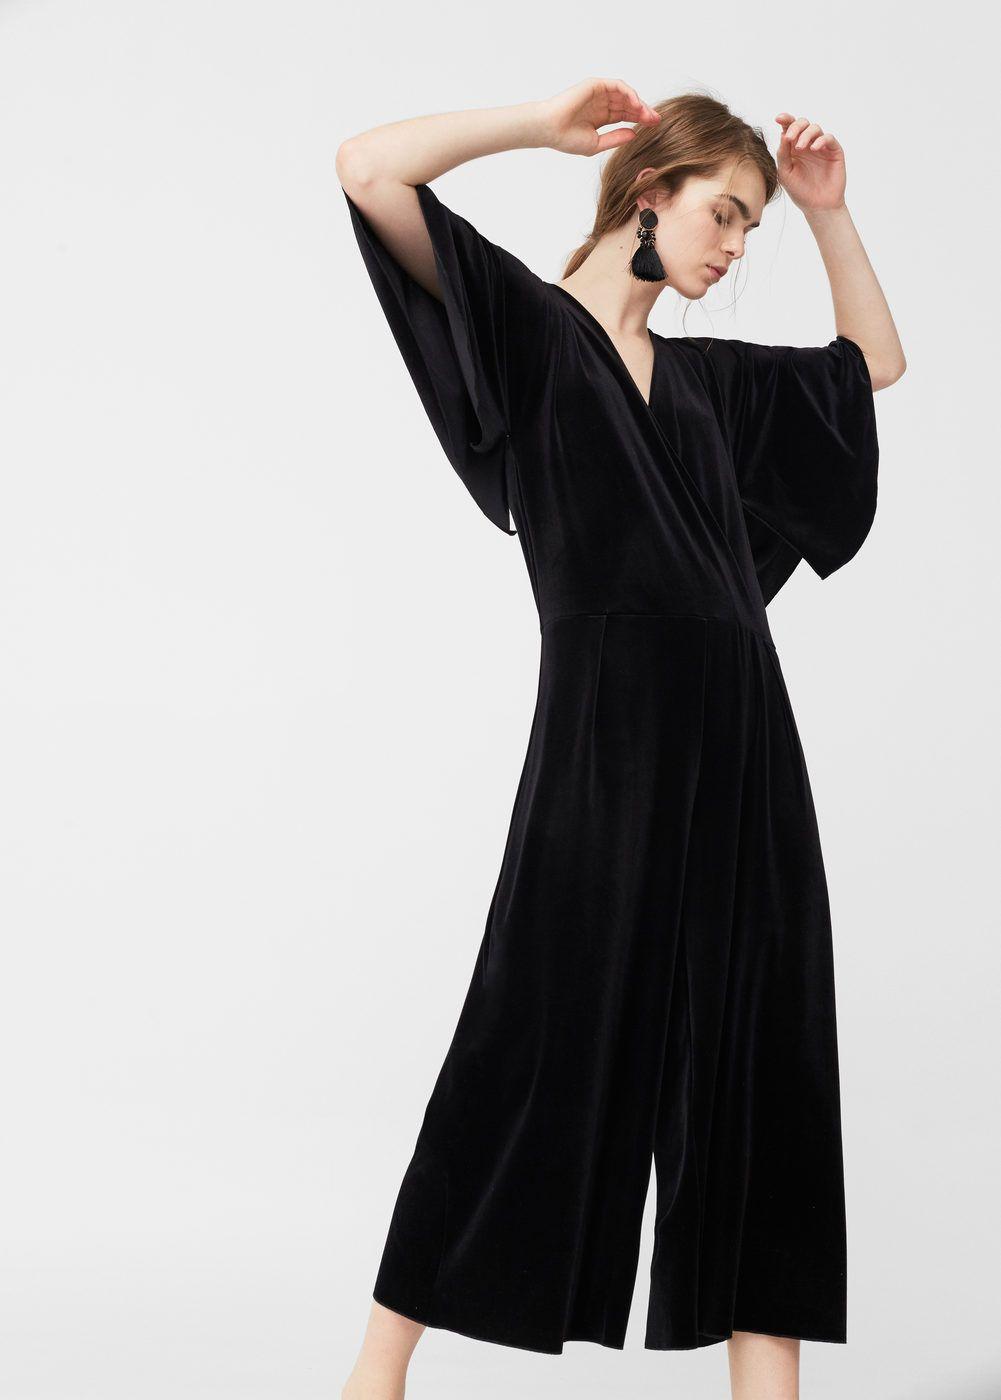 Combinaison palazzo velours - Femme   People I Admire   Pinterest ... 632537685db6